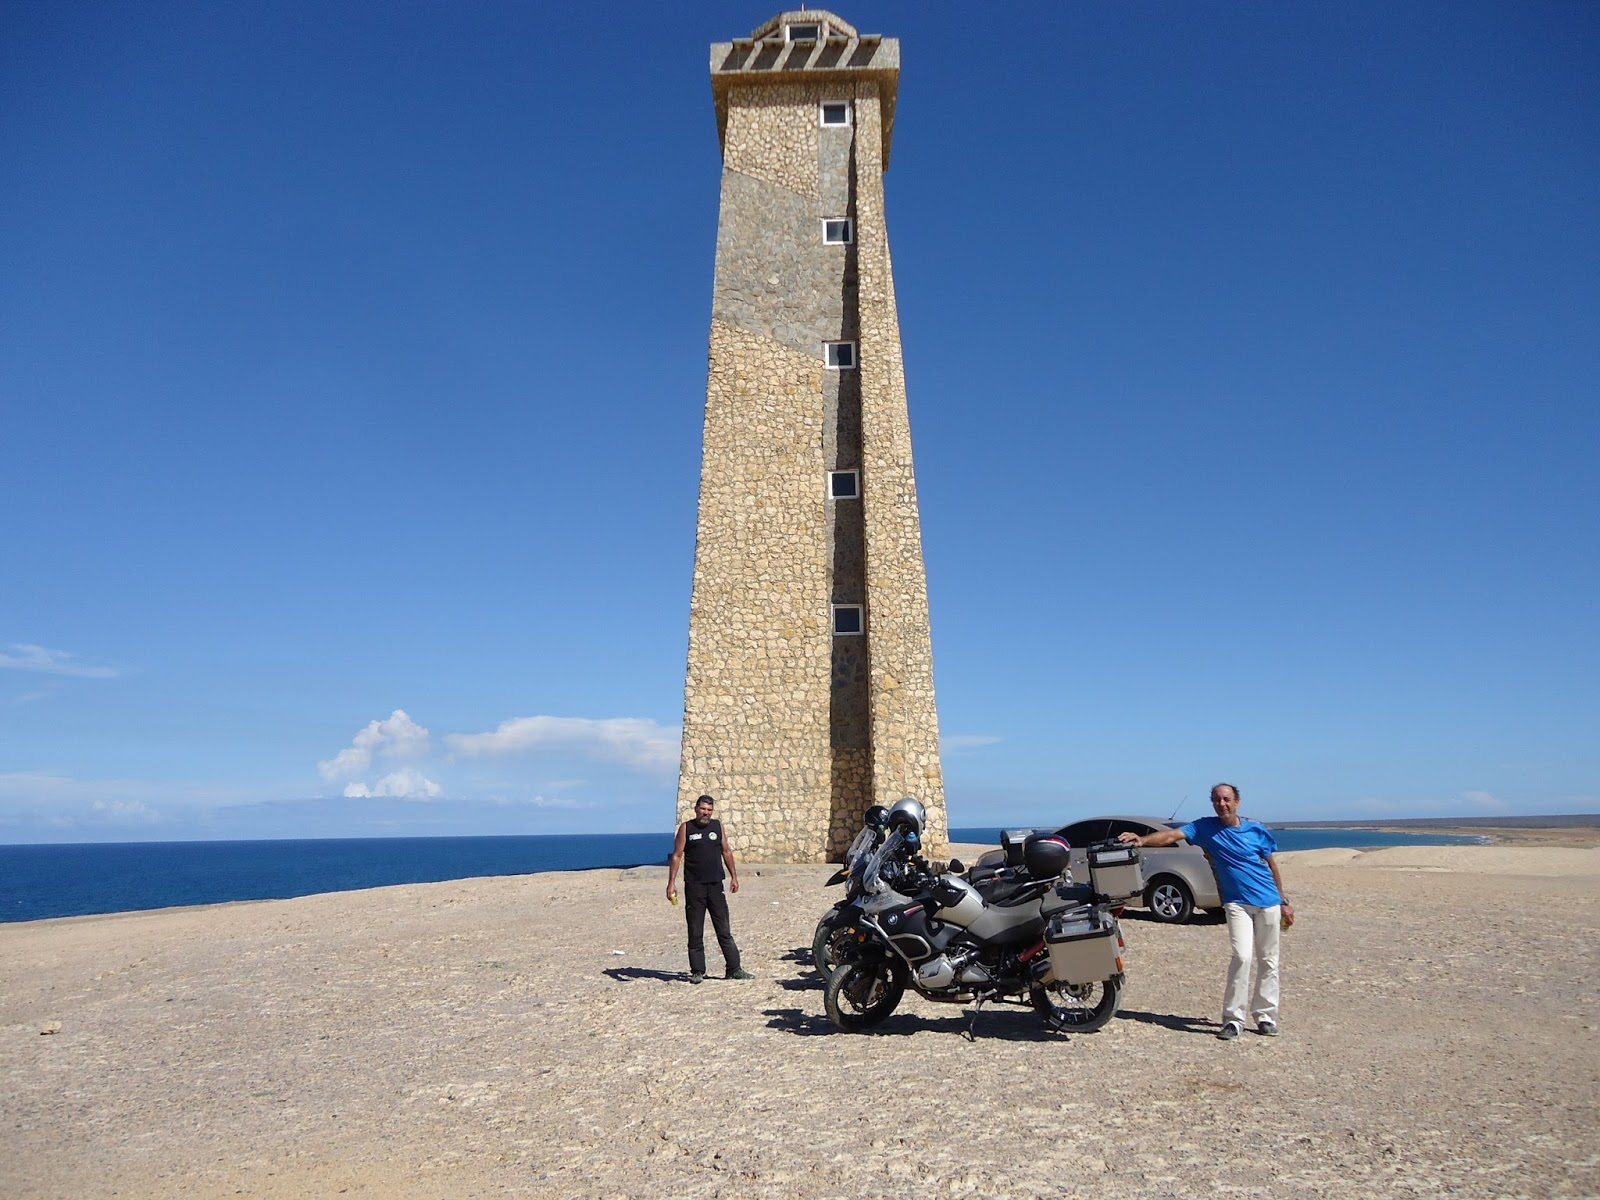 Viajeros en 2ruedas ruta valencia judibana cabo san roman tiraya moruy adicora valencia - Cabo san roman ...